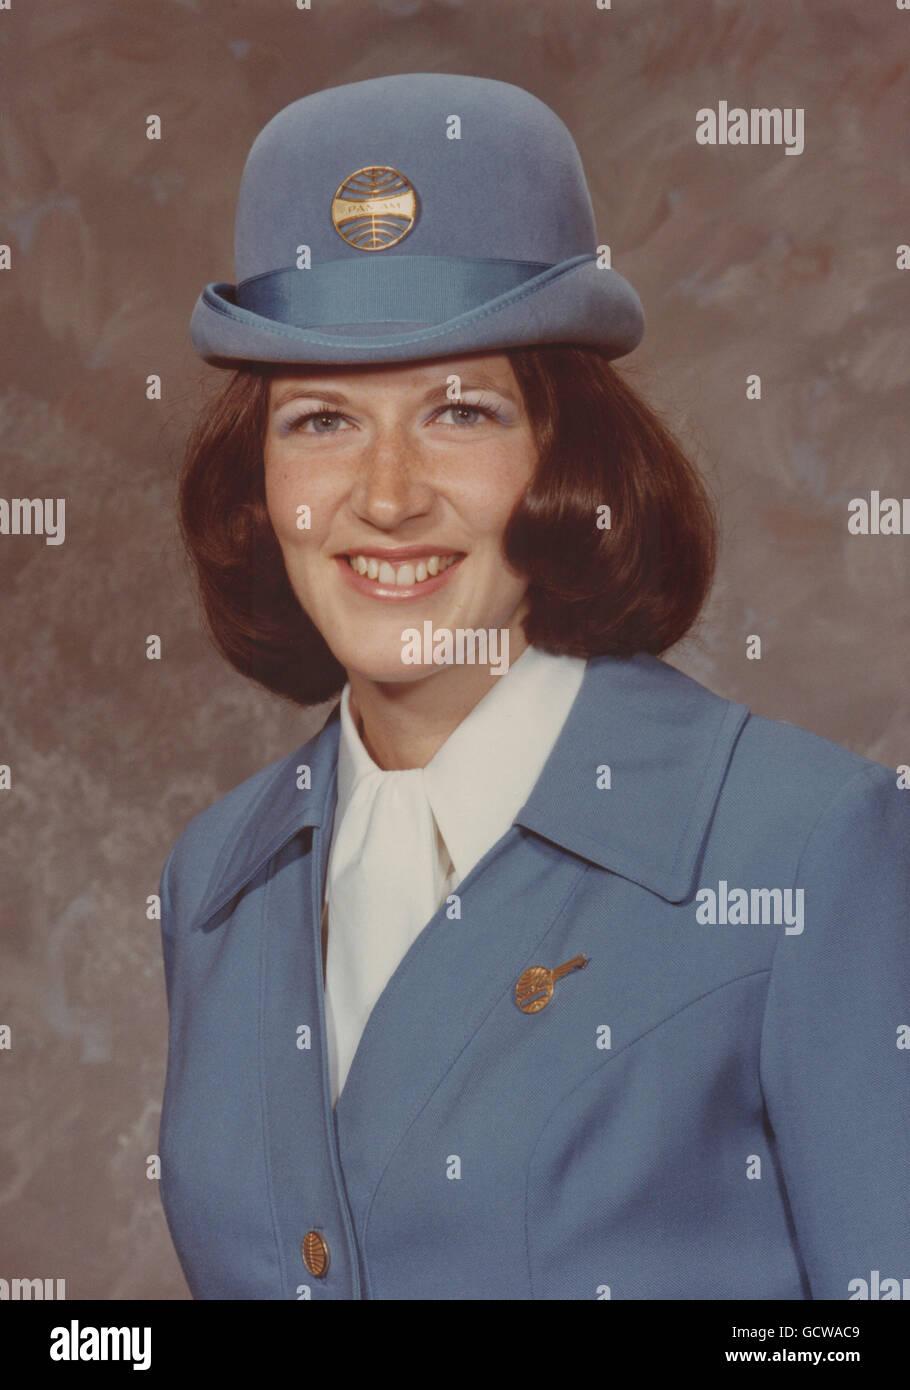 Pan American Airlines Flight Stewardess  1973, USA - Stock Image